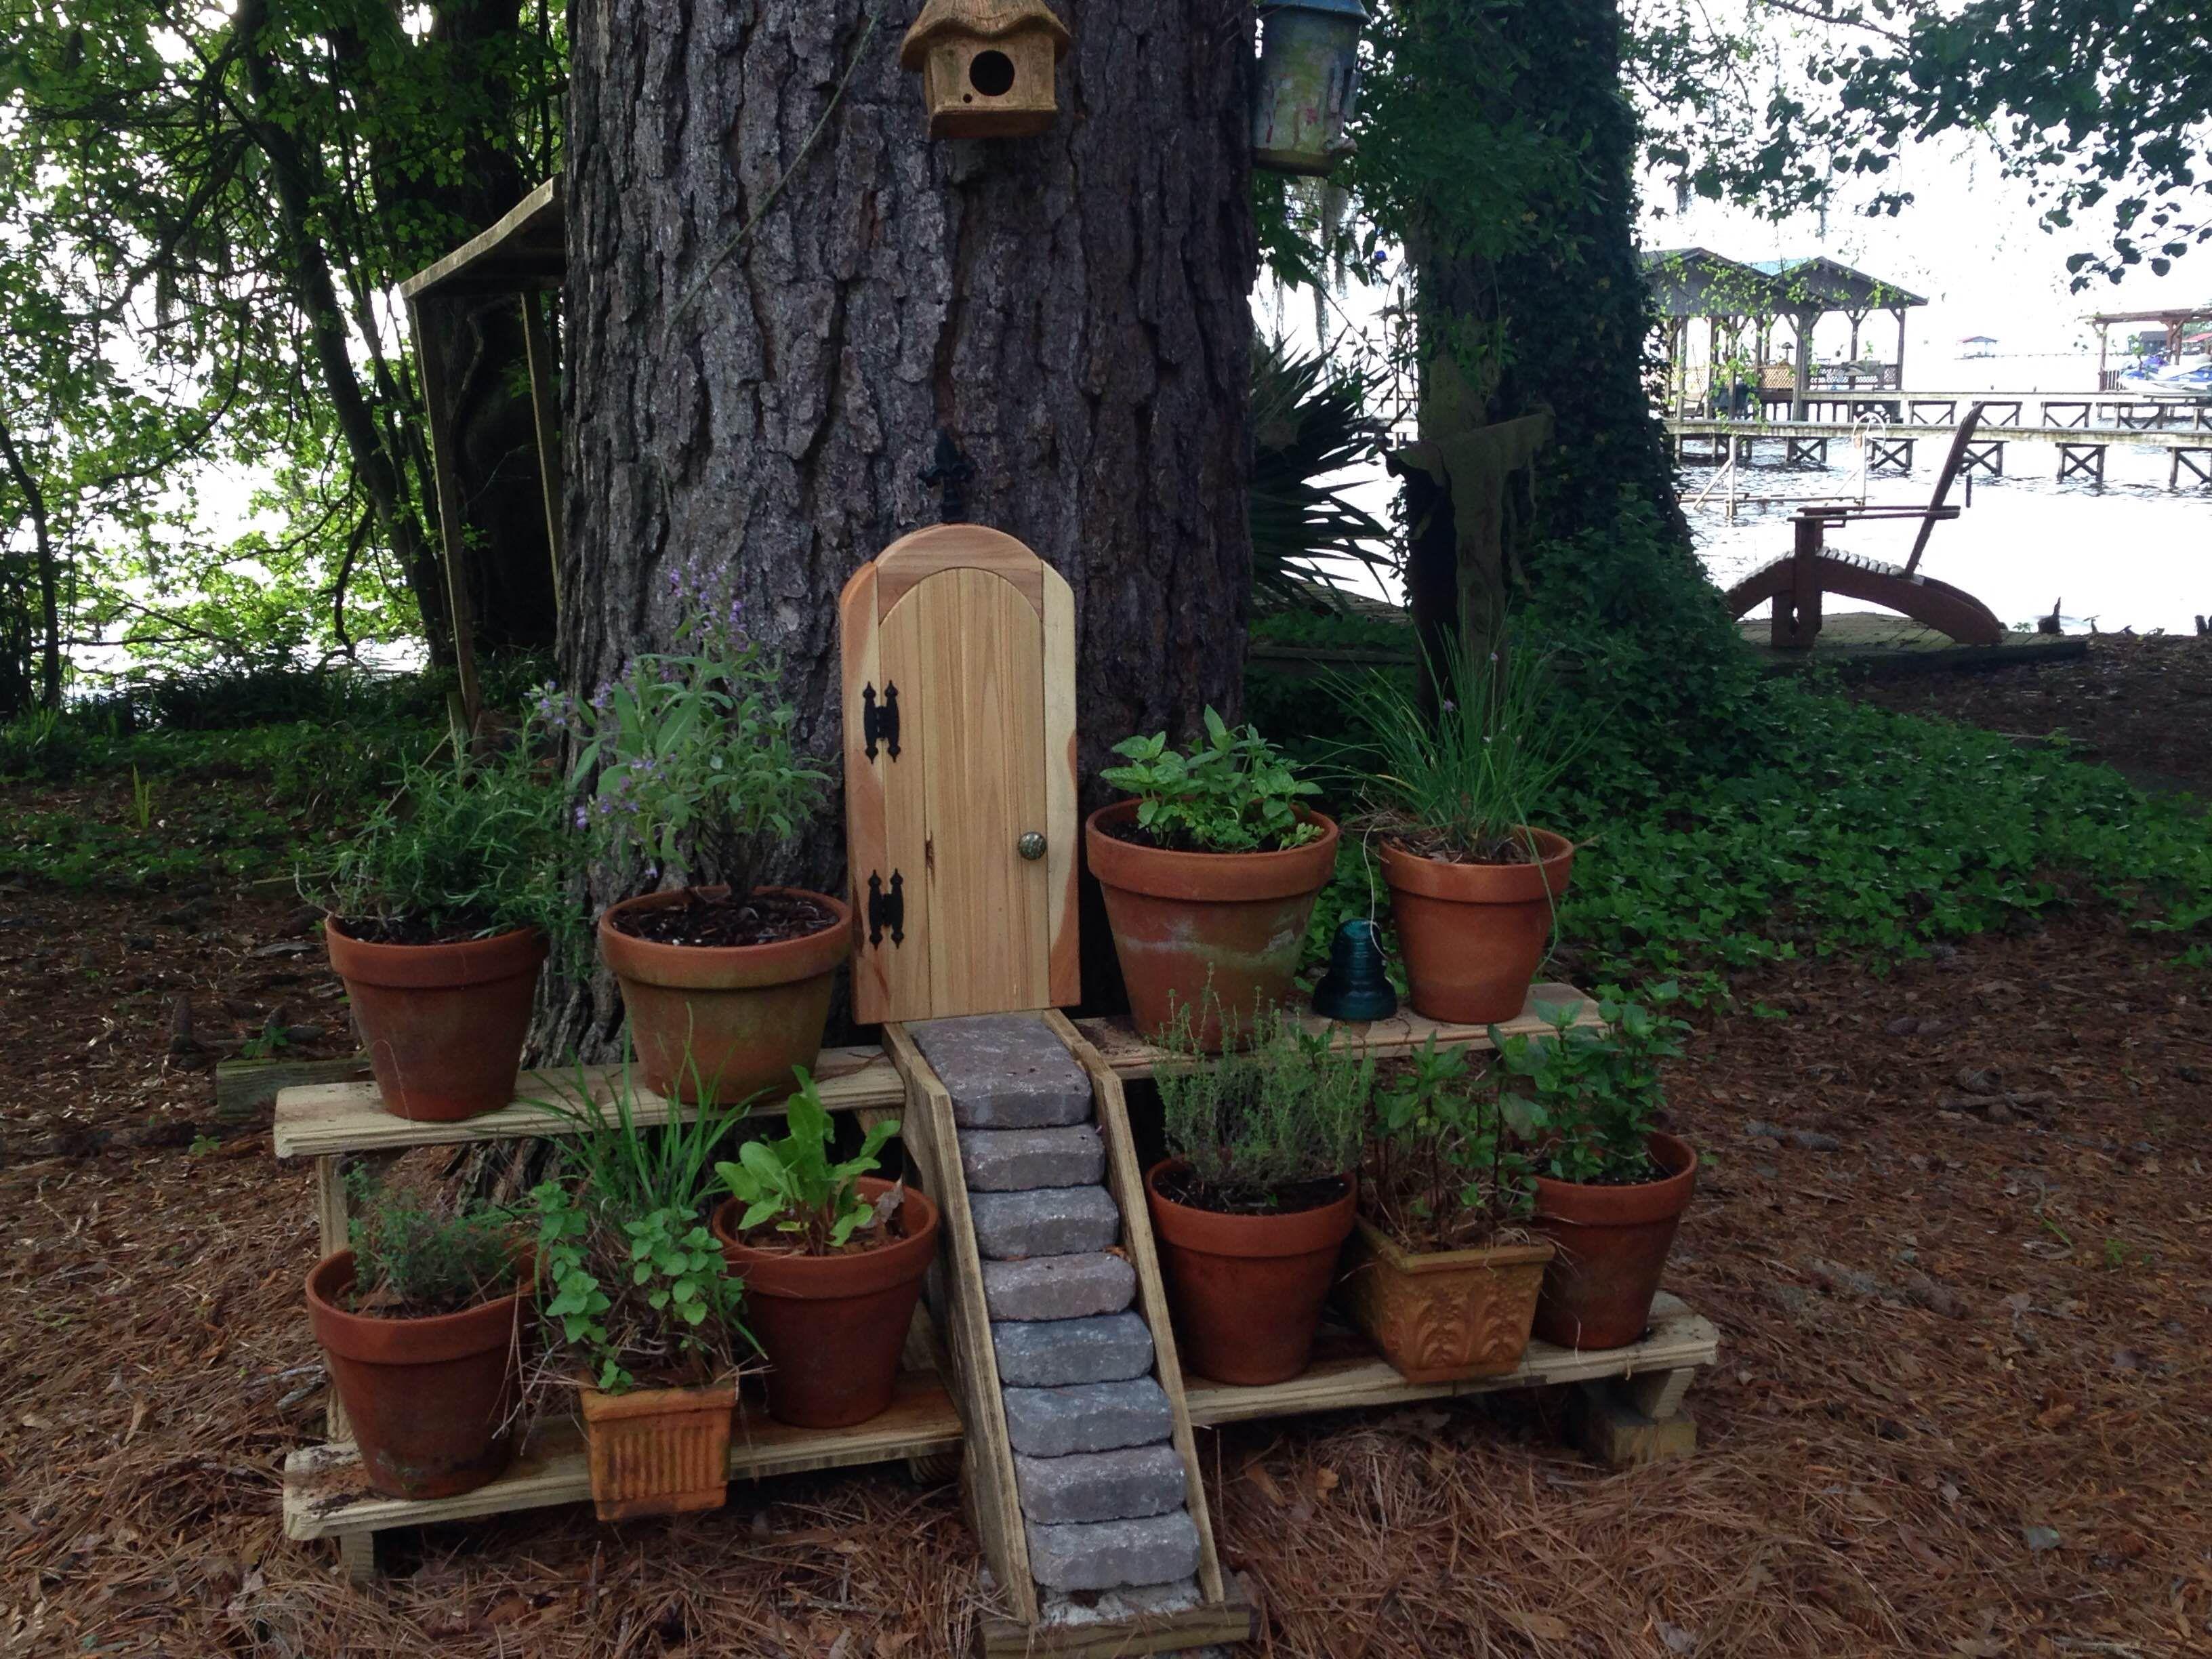 Hobbit Herb Home @ Lake Waccamaw, NC | Plants, Lake, Herbs